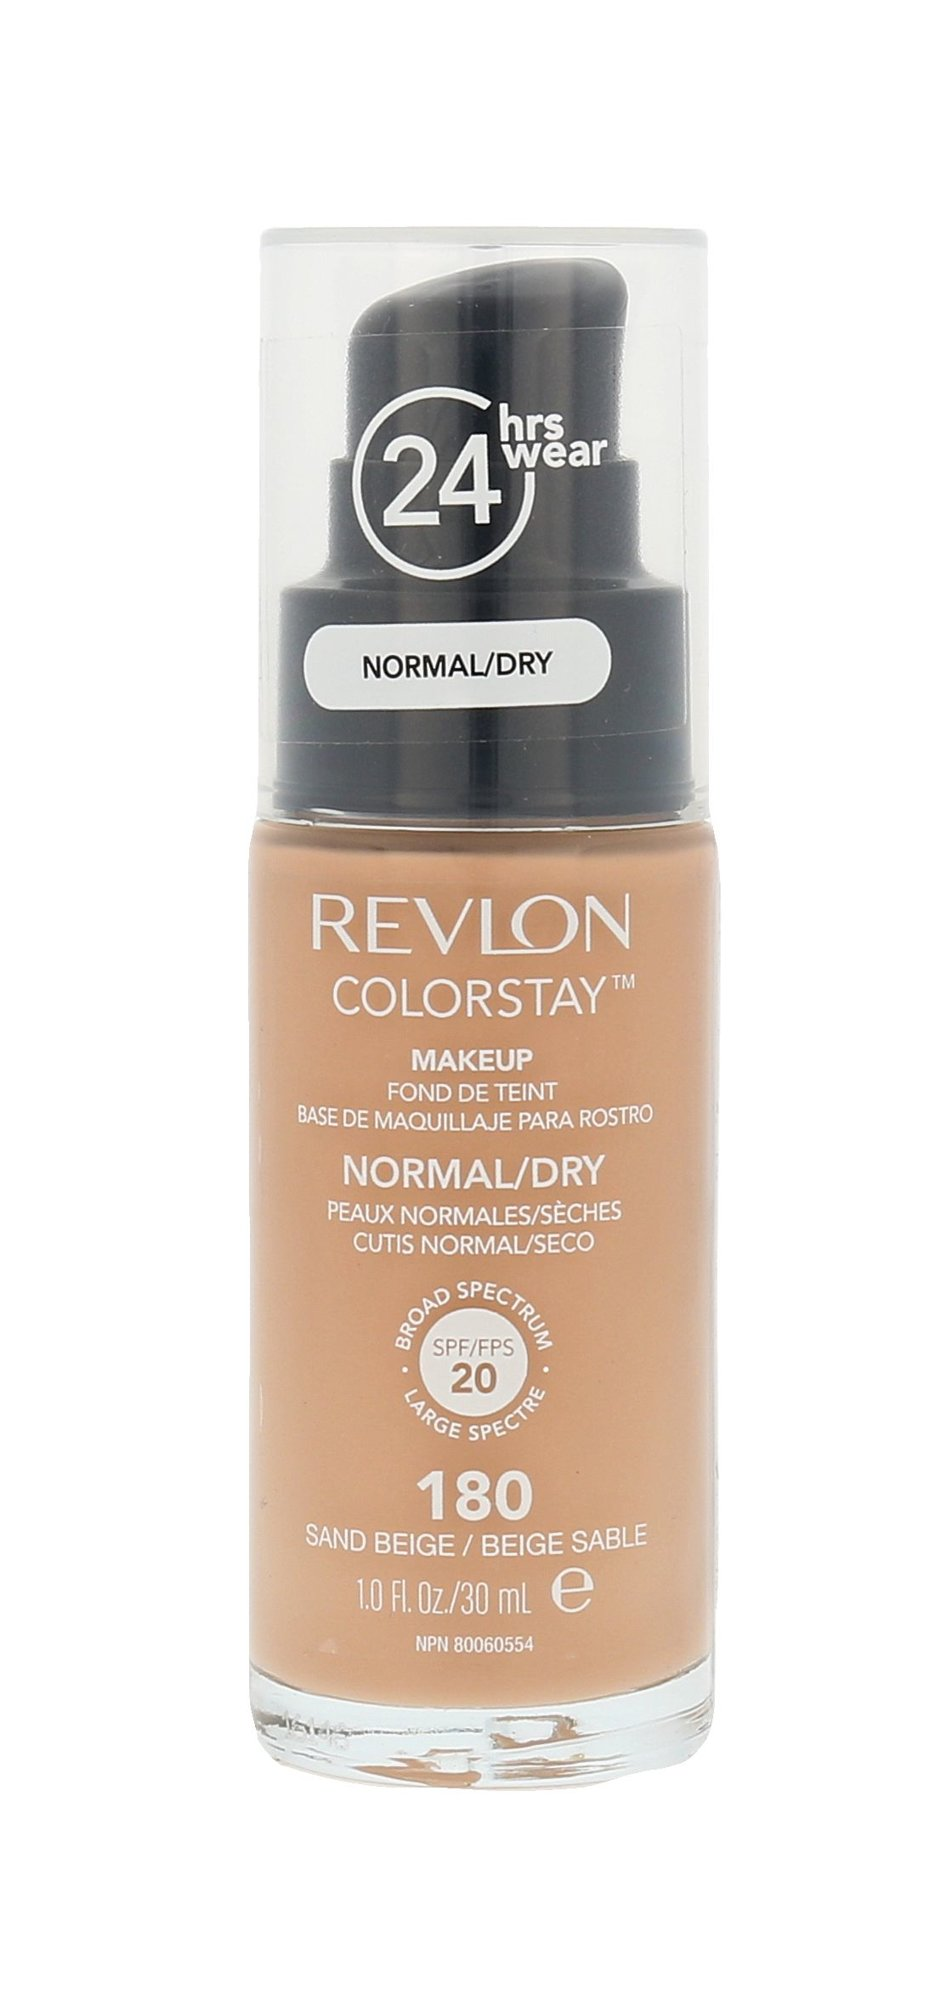 Revlon Colorstay Cosmetic 30ml 180 Sand Beige